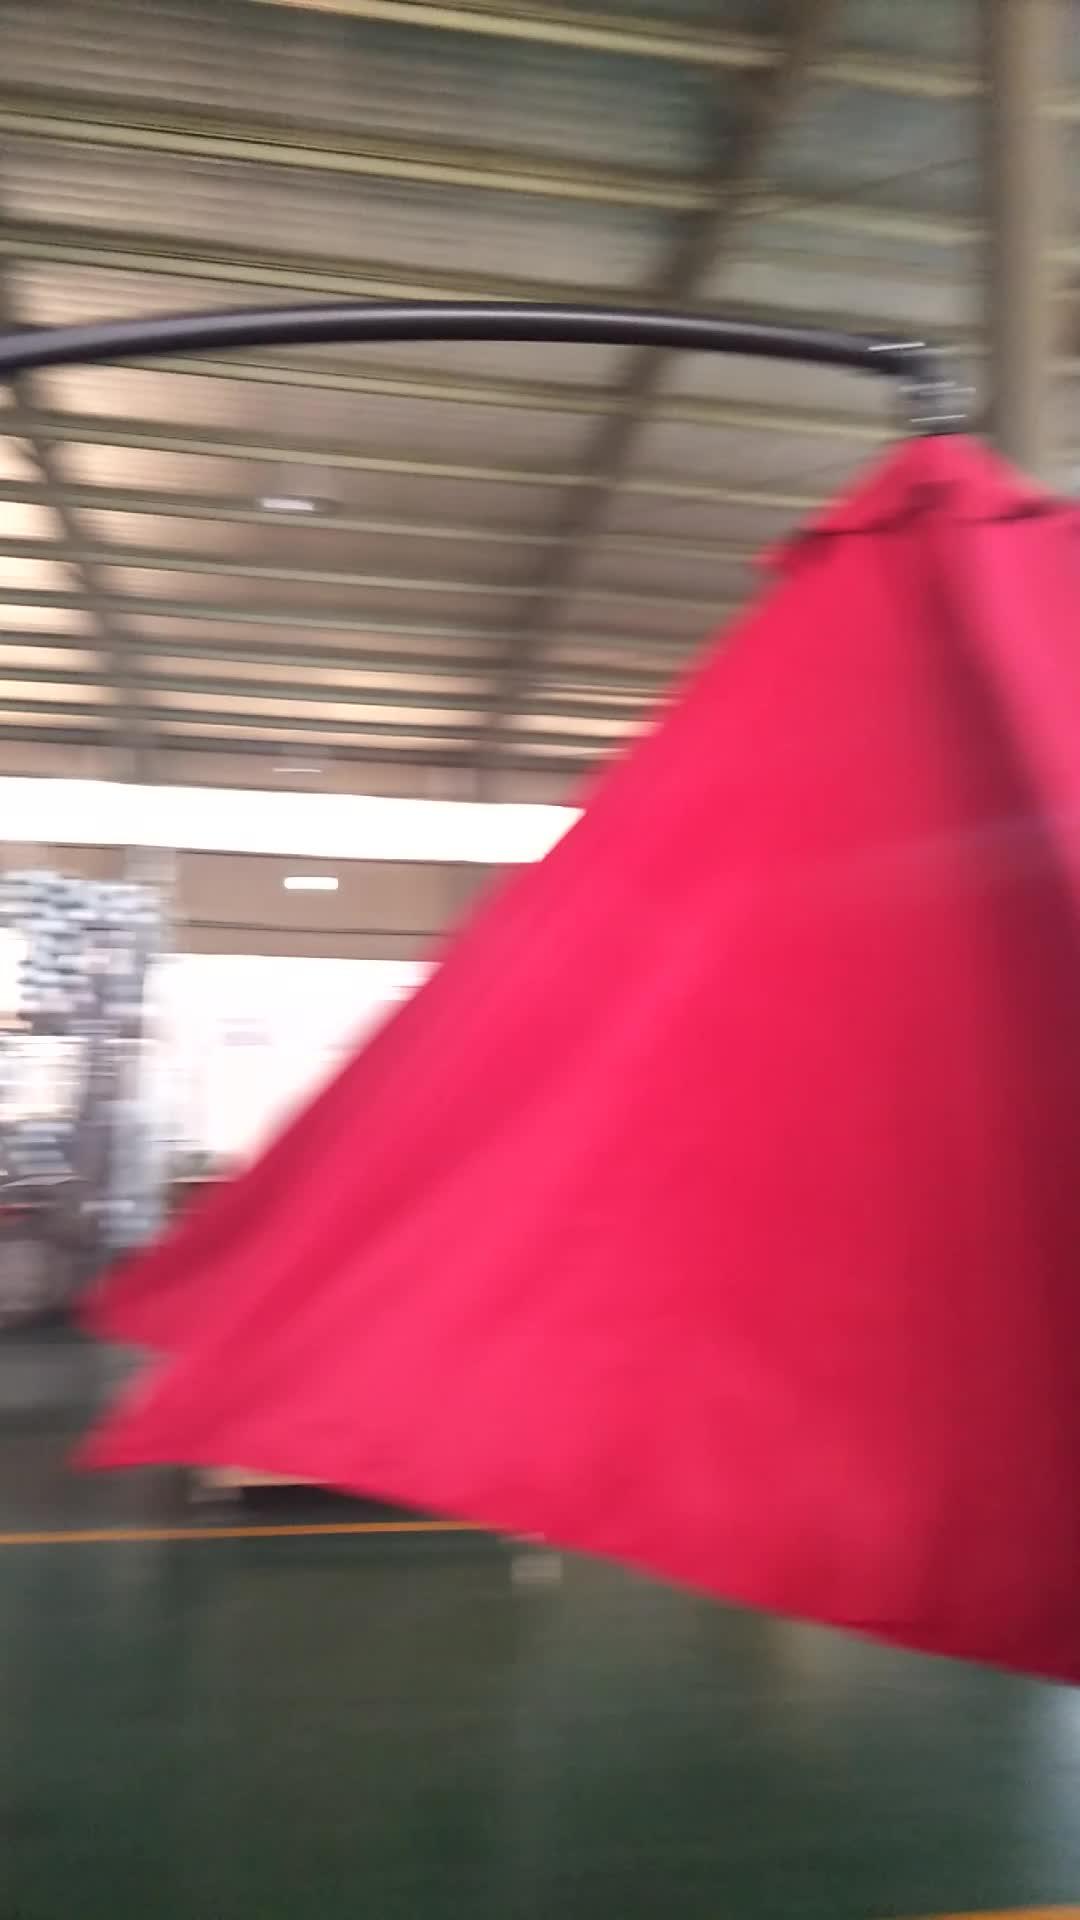 3 mt hängen sonnenschirm stahl banane outdoor-dach